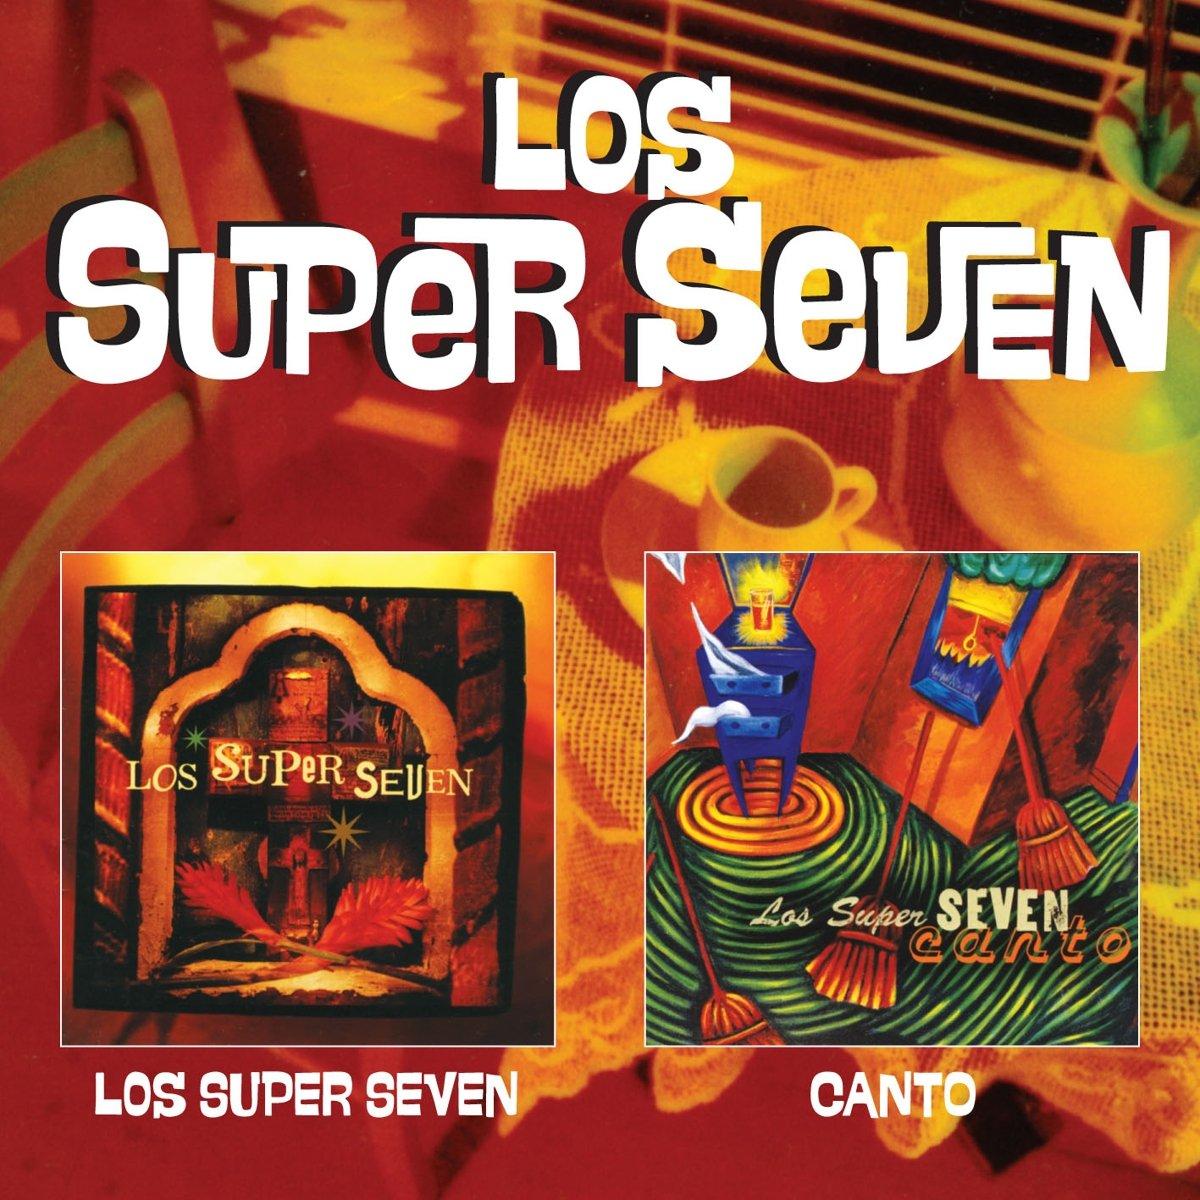 CD : Los Super Seven - Los Super Seven / Canto (United Kingdom - Import)